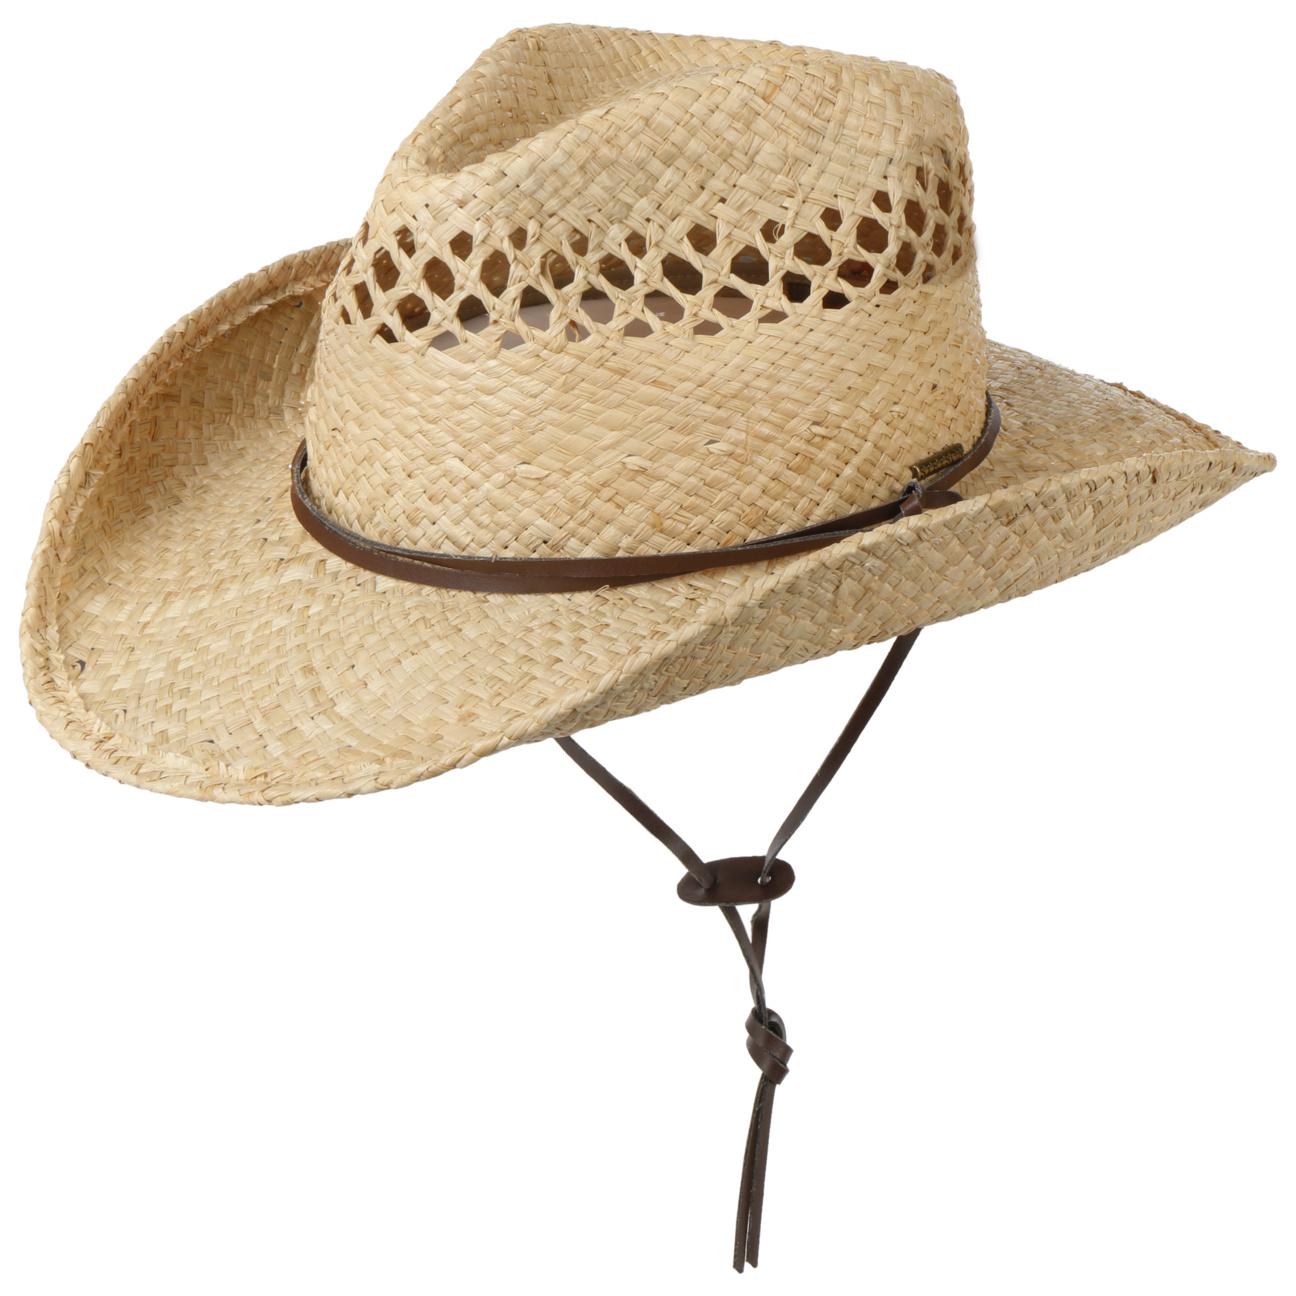 4ffc4d9fffd47 Imagenes de sombreros vaqueros para hombres jpg 1296x1296 Sombreros  vaqueros para hombre